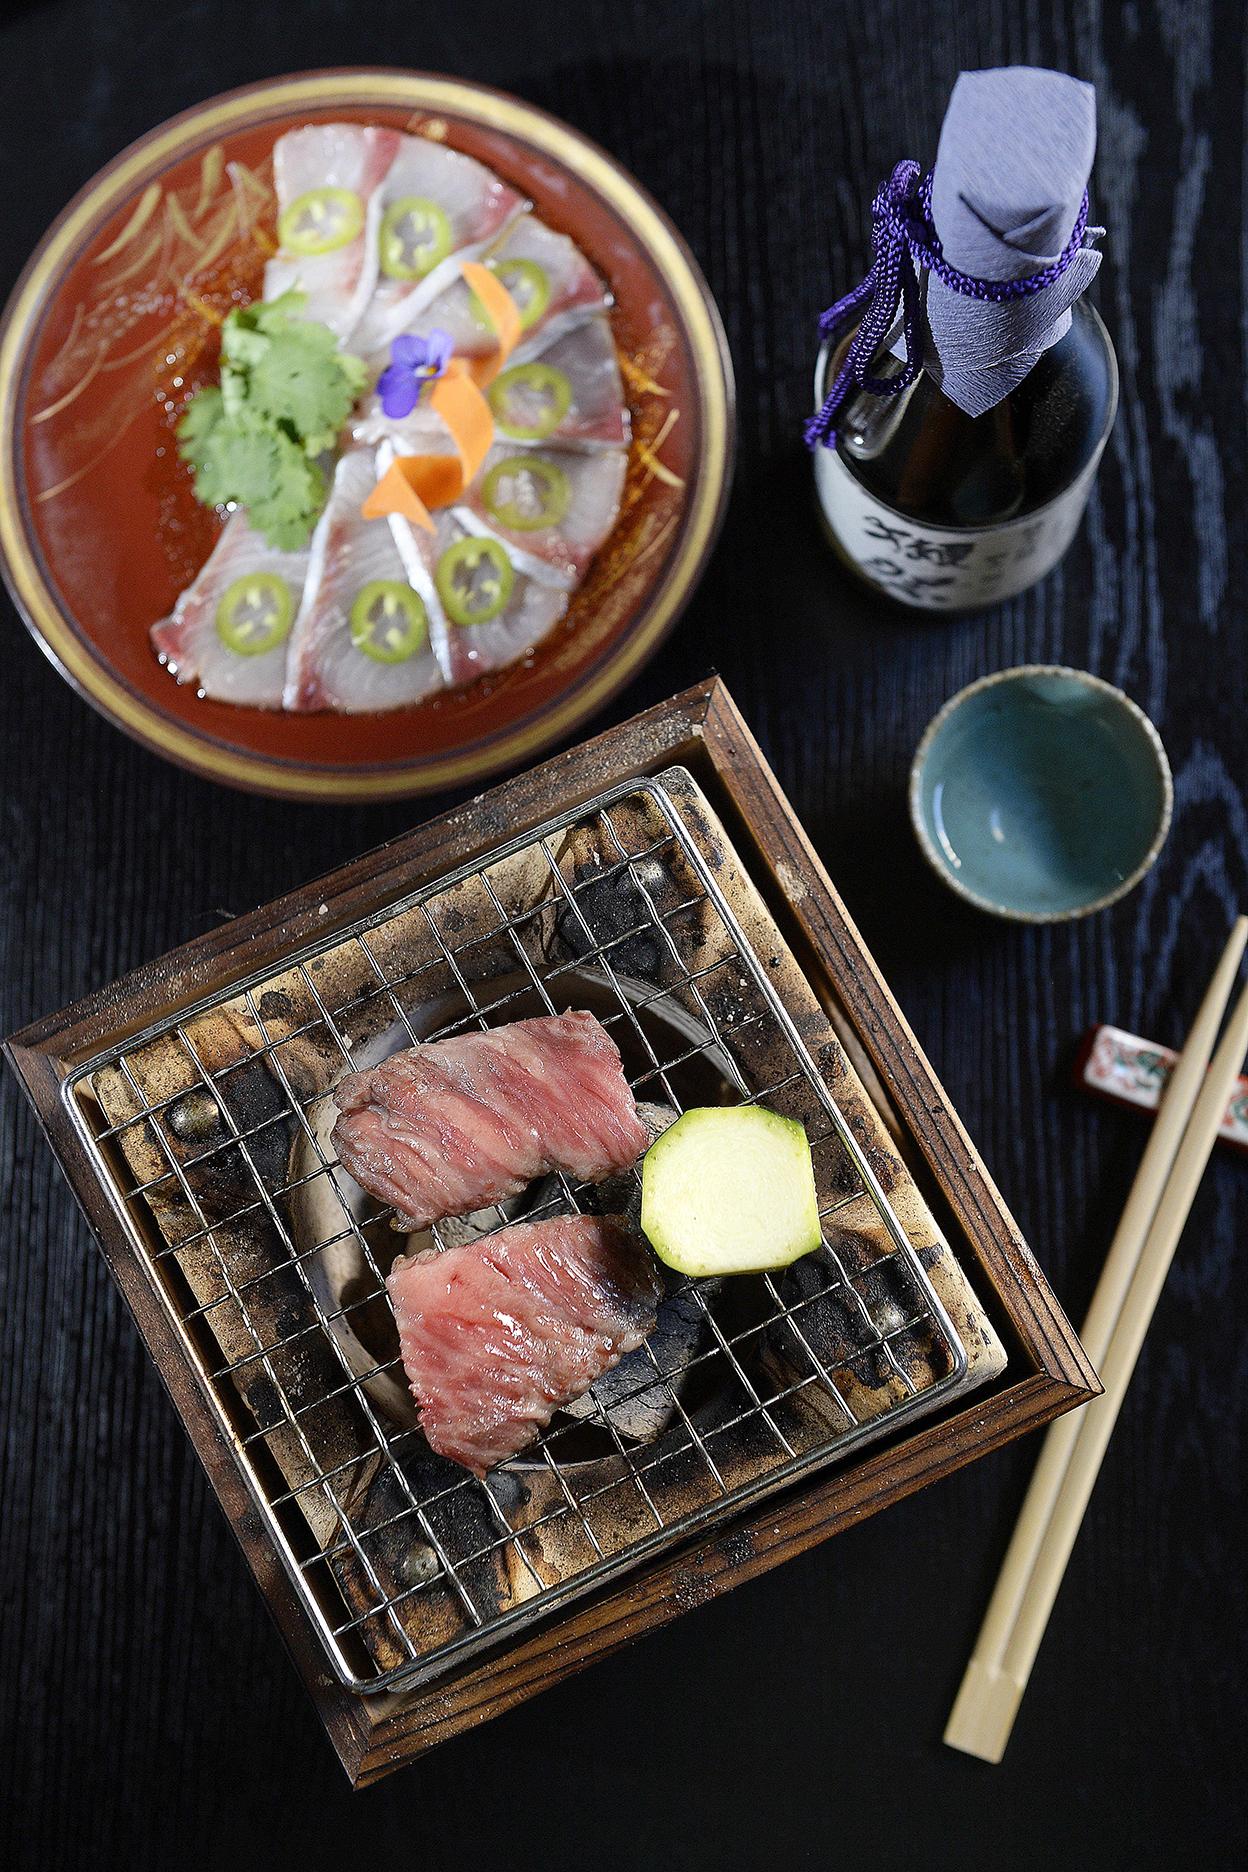 CHP_Export_133276009_Kingfish sashimi with Jalapeno %26 Wagyu beef Robata  at Himeji Japanese Grote St.jpg